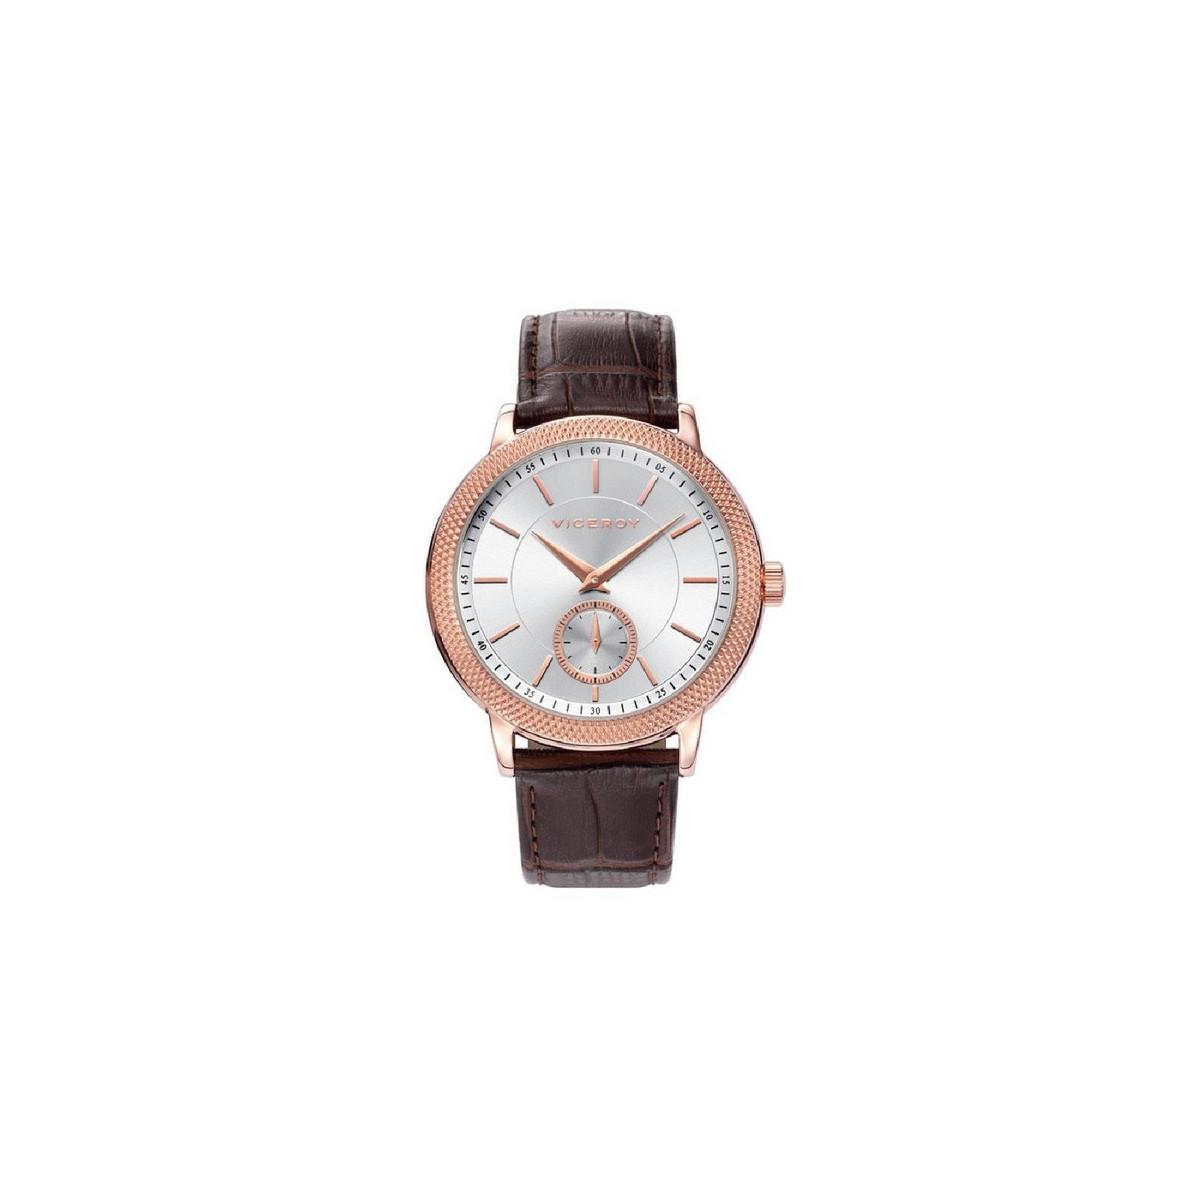 Reloj Viceroy Luxury 401025-07